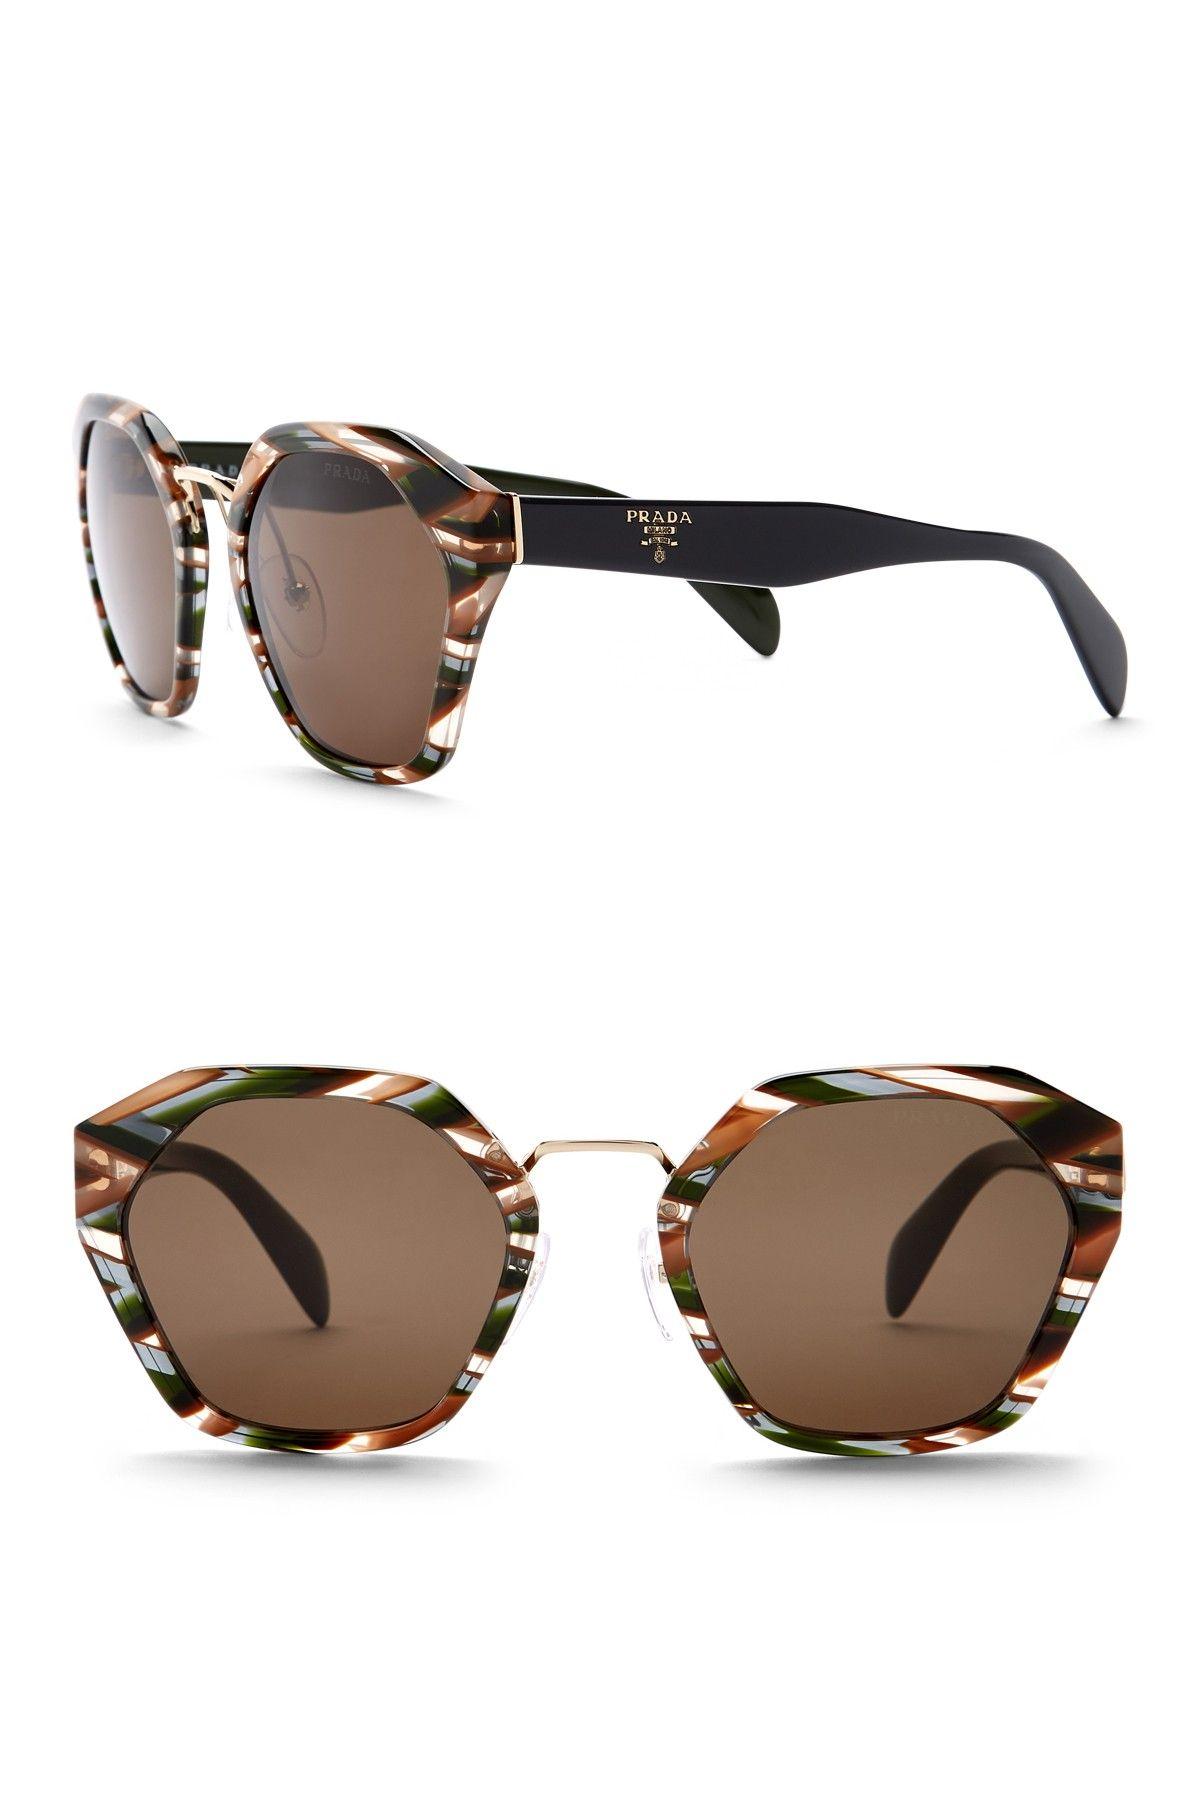 8e4843c35070 Women's Irregular Heritage 55mm Sunglasses. Women's Irregular Heritage 55mm  Sunglasses Cat Eye Sunglasses, Prada ...